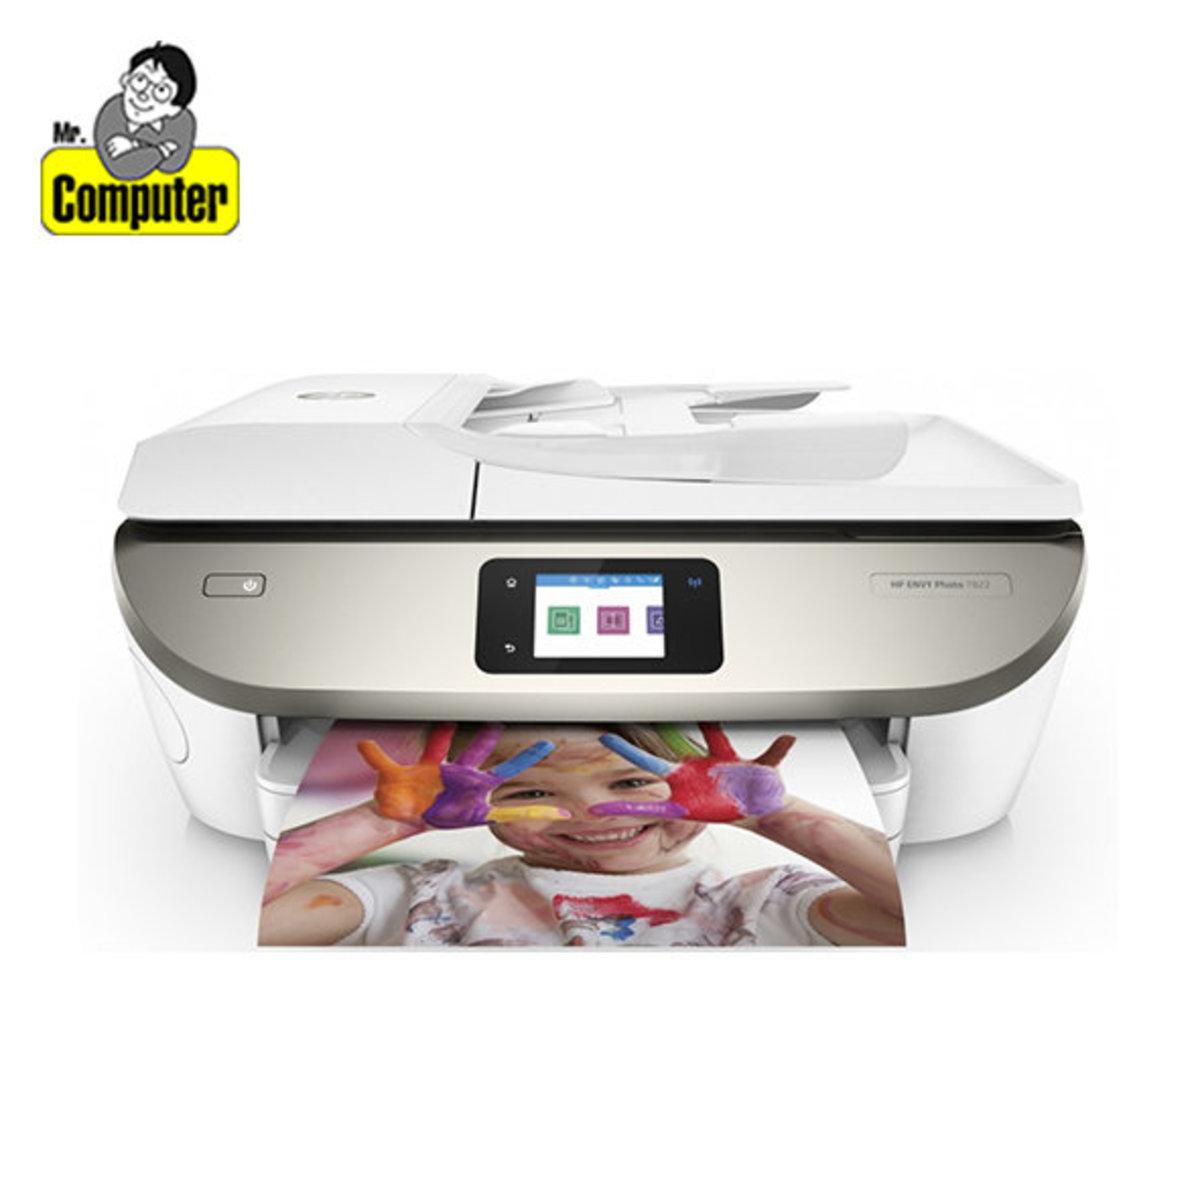 ENVY 7822 4in1 multi-function photo printer